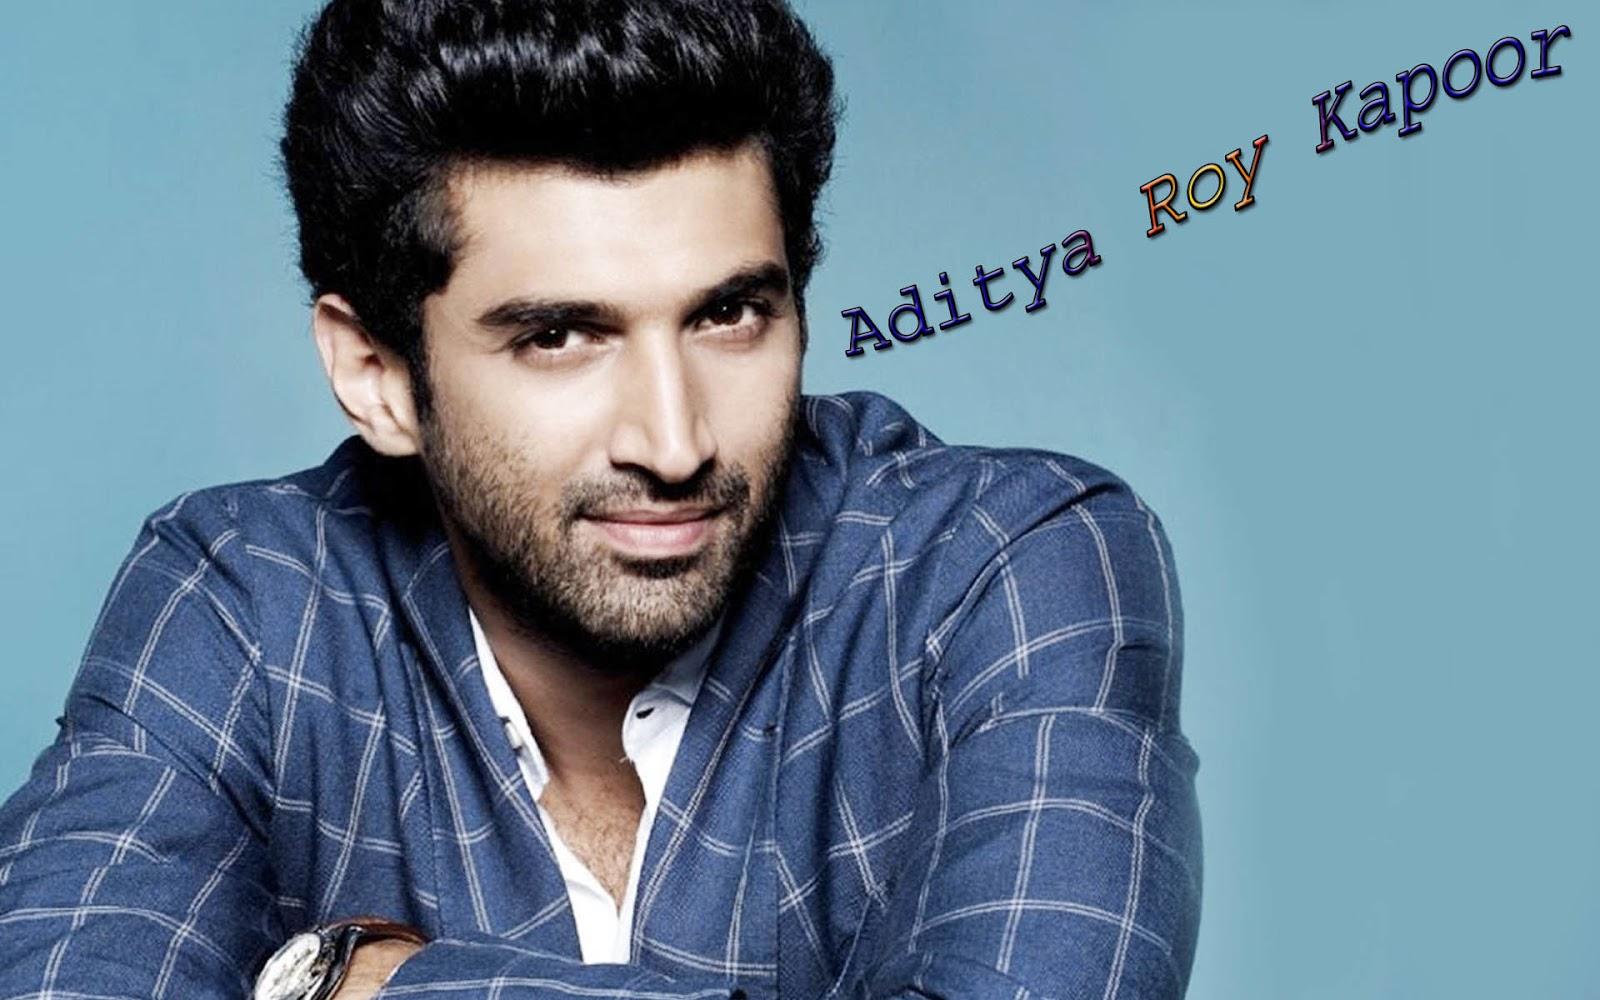 Aditya Roy Kapoor Hd Wallpaper: Best And Hot Bollywood Actor Aditya Roy Kapoor Wide Screen